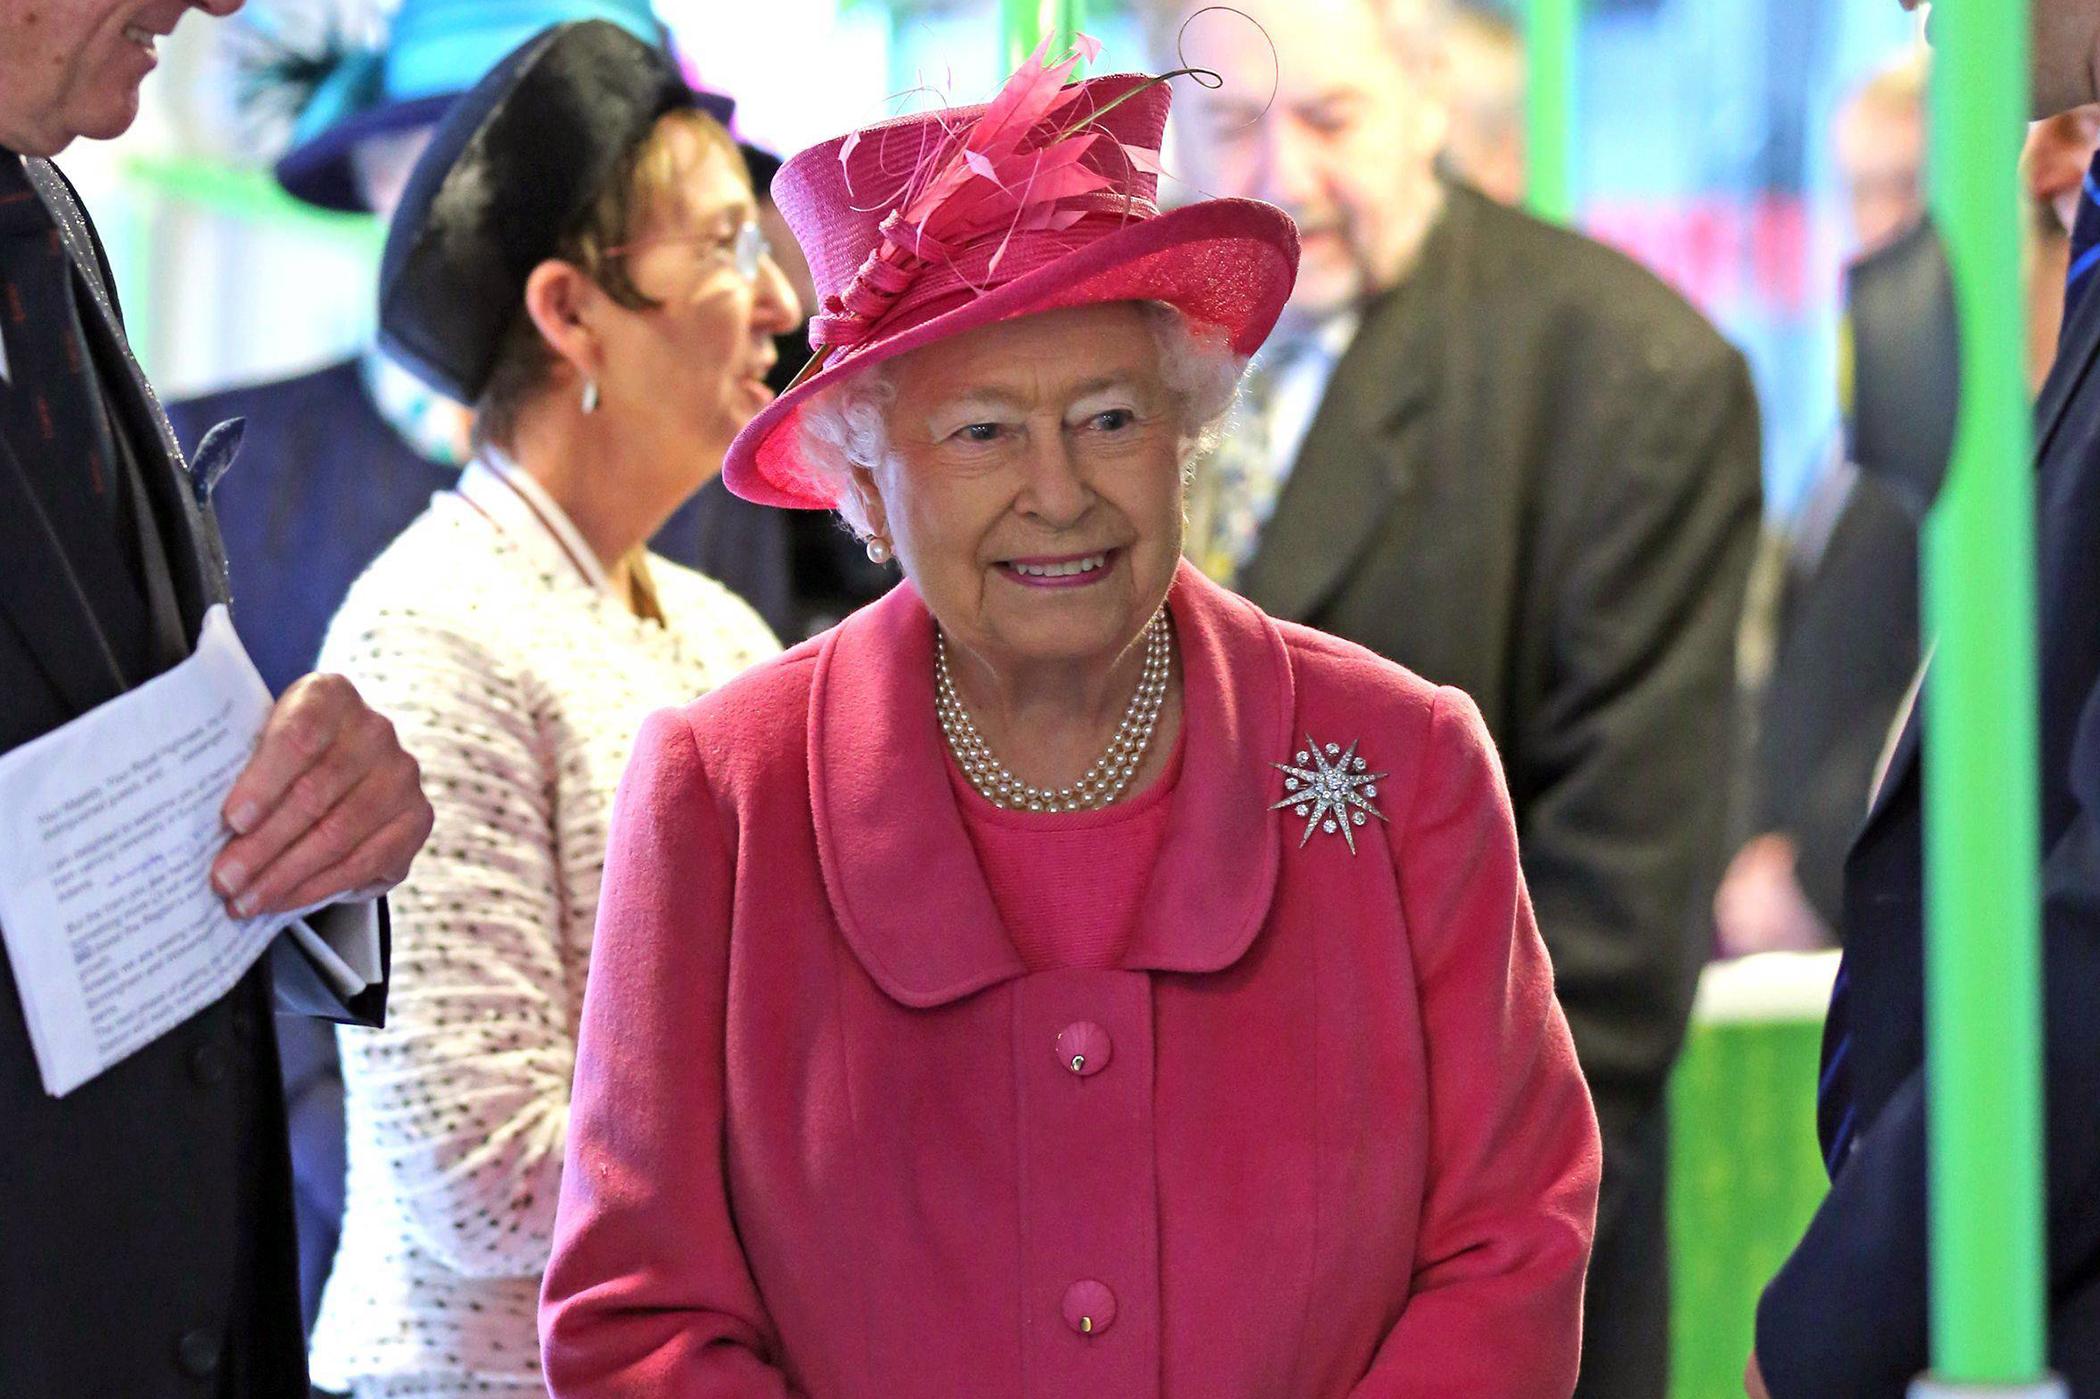 Queen Elizabeth visits the Metroline Tramline Extension in Birmingham, November 19, 2015